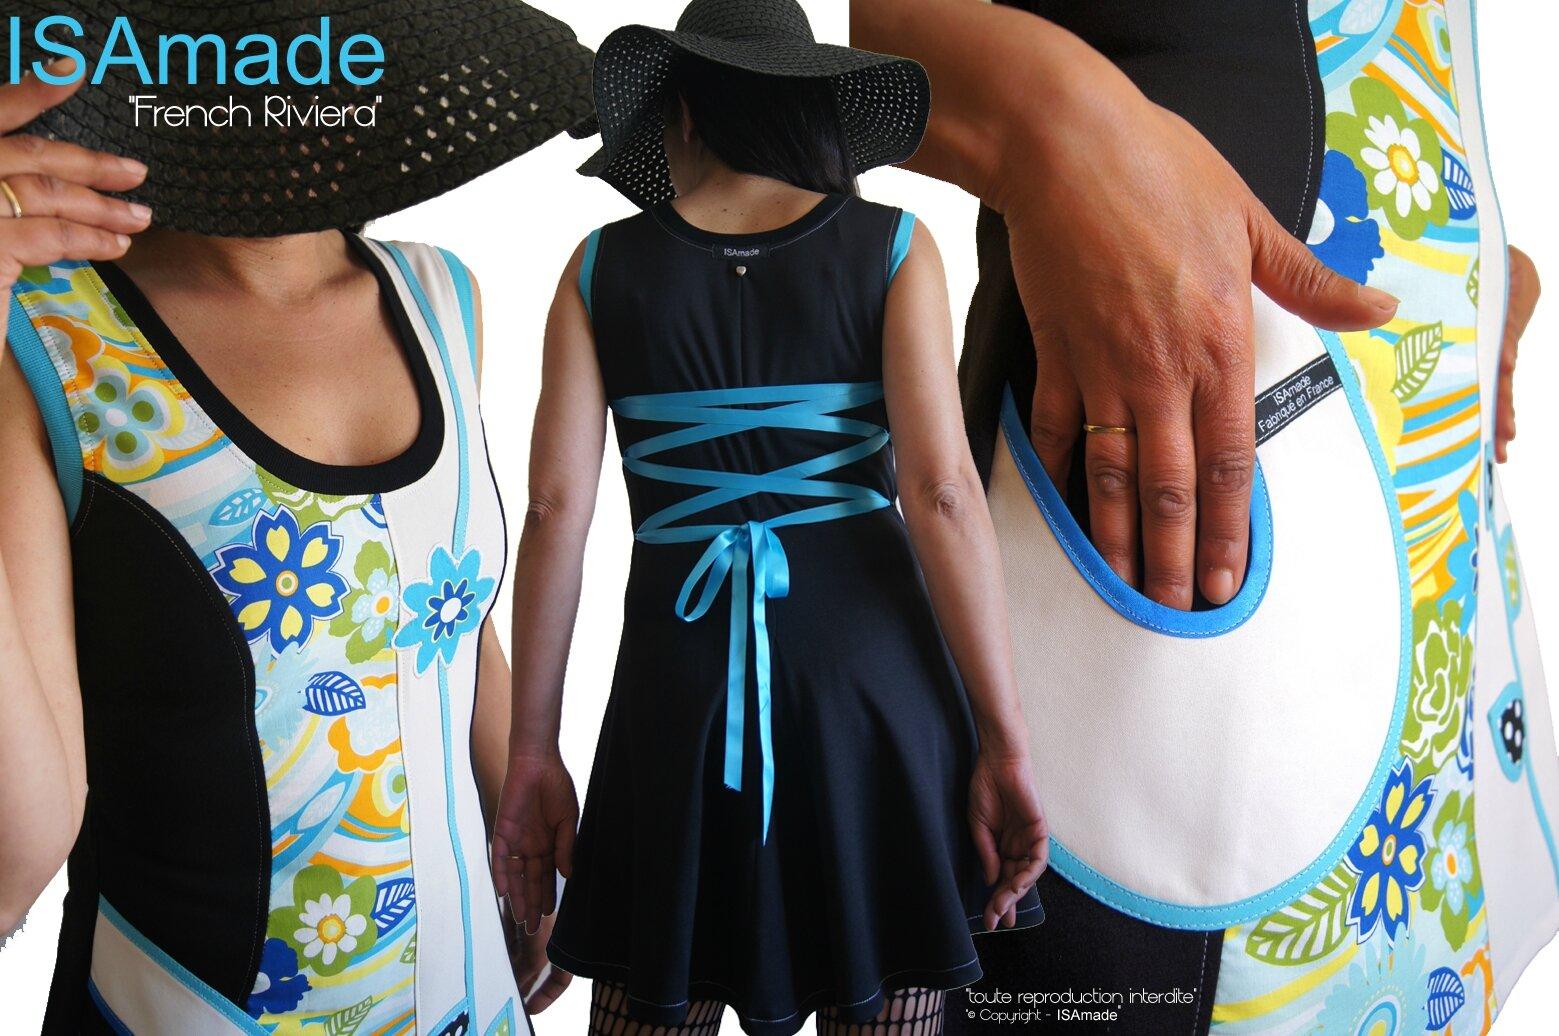 MOD 425B robe colorée fleurie noir bleu turquoise orange vert anis chic fantaisie originale made in france